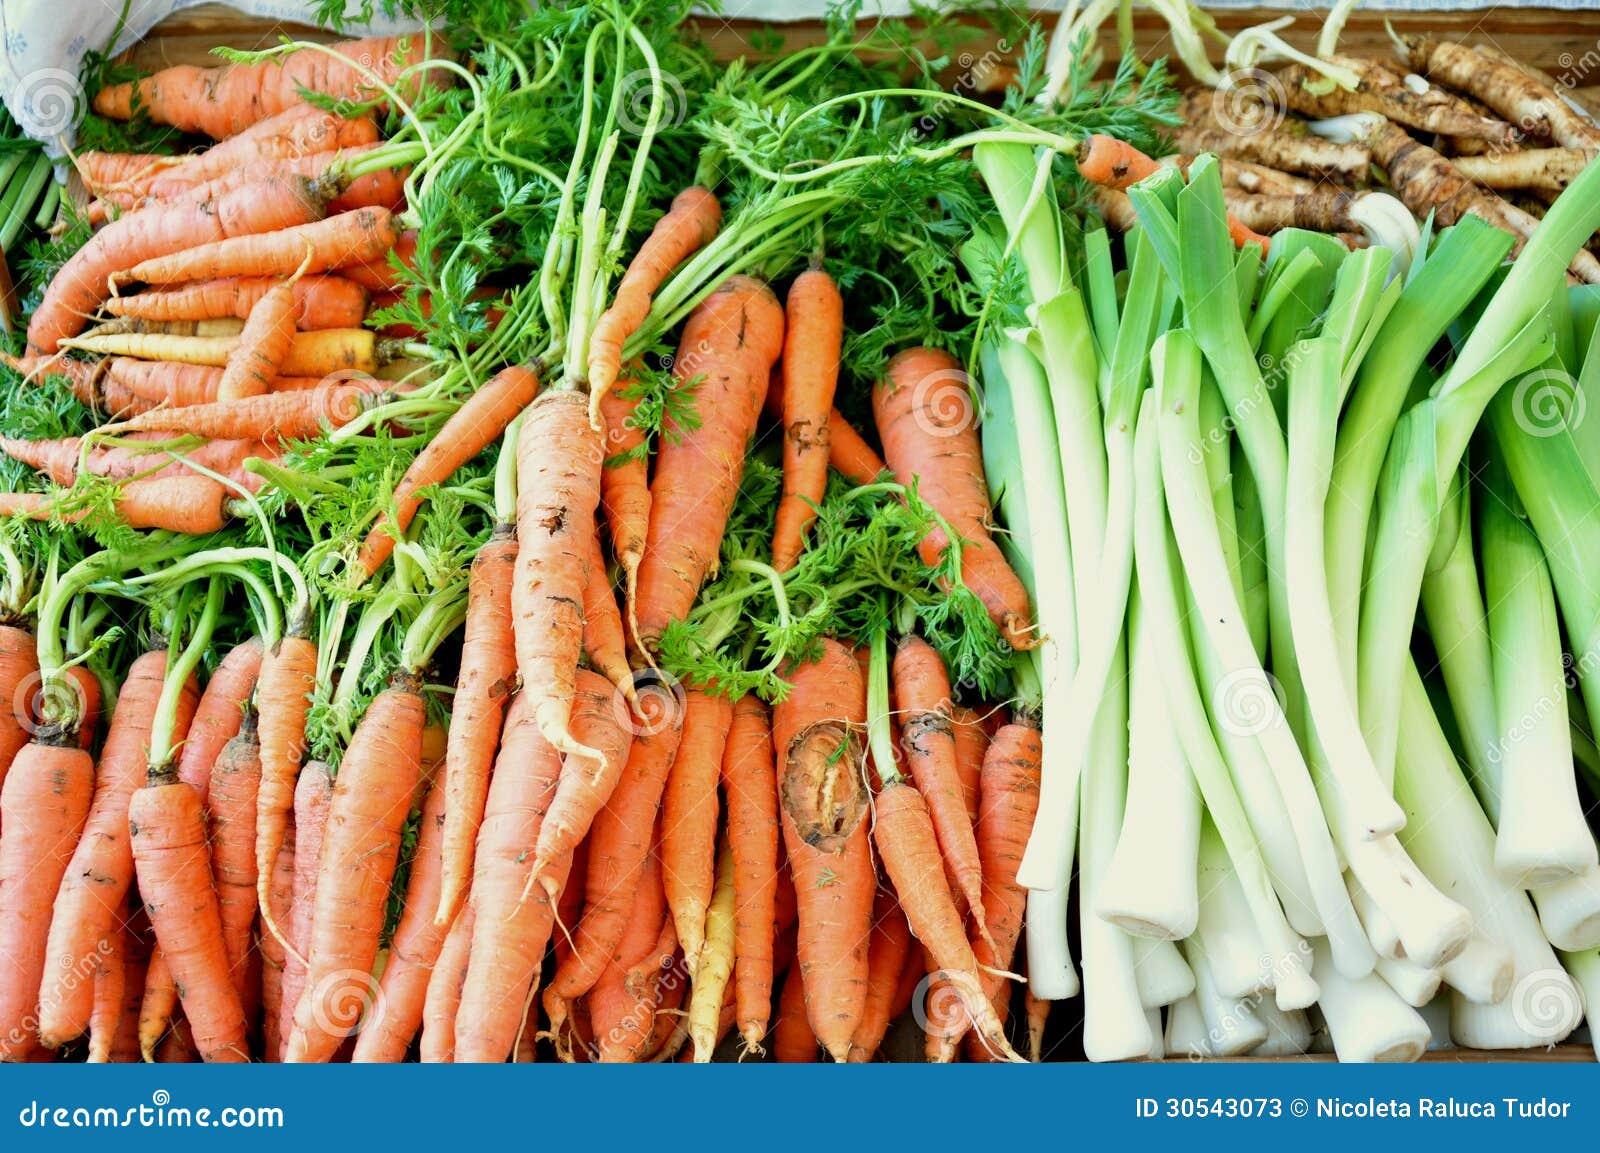 Growing Healthy Organic Food